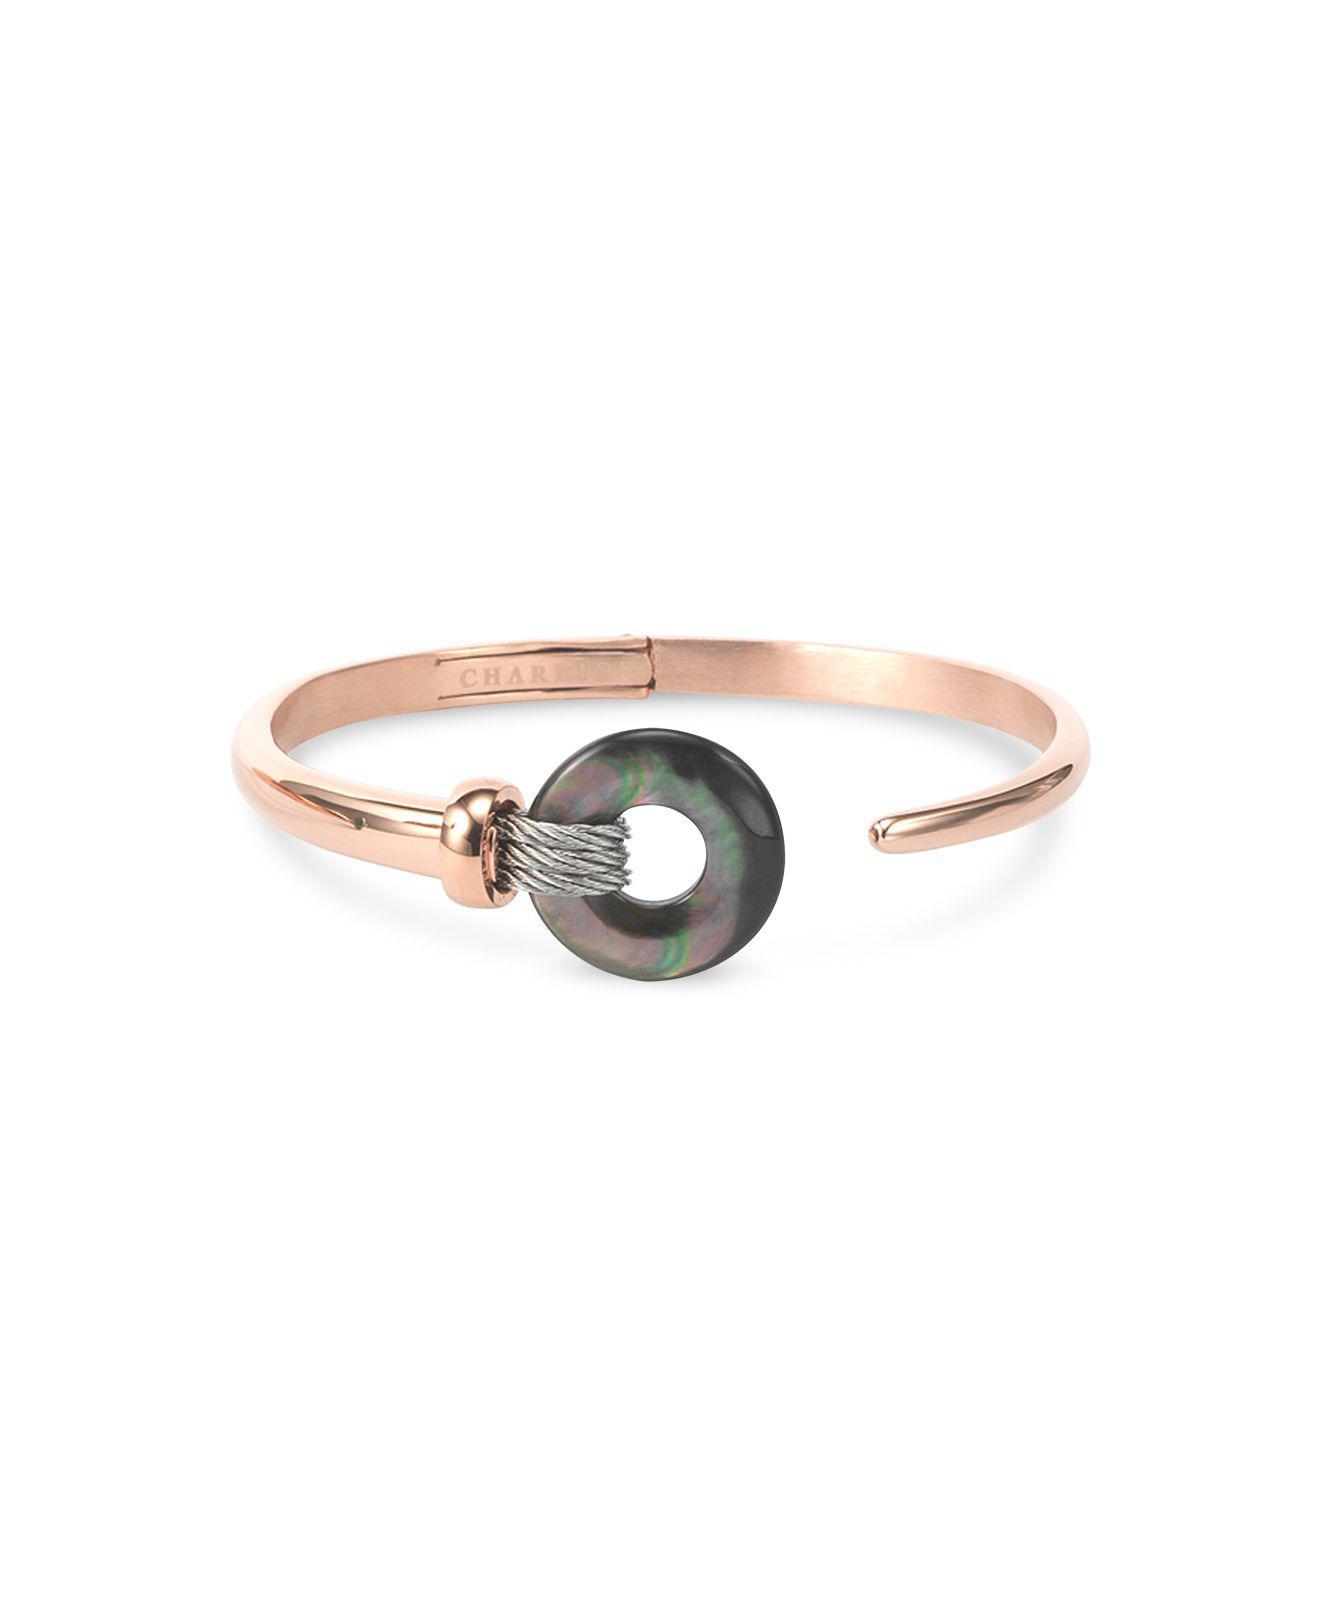 6e0ba0e3d7e Lyst charriol black mother of pearl two tone bangle bracelet jpg 1320x1616  Charriol bracelets women leather